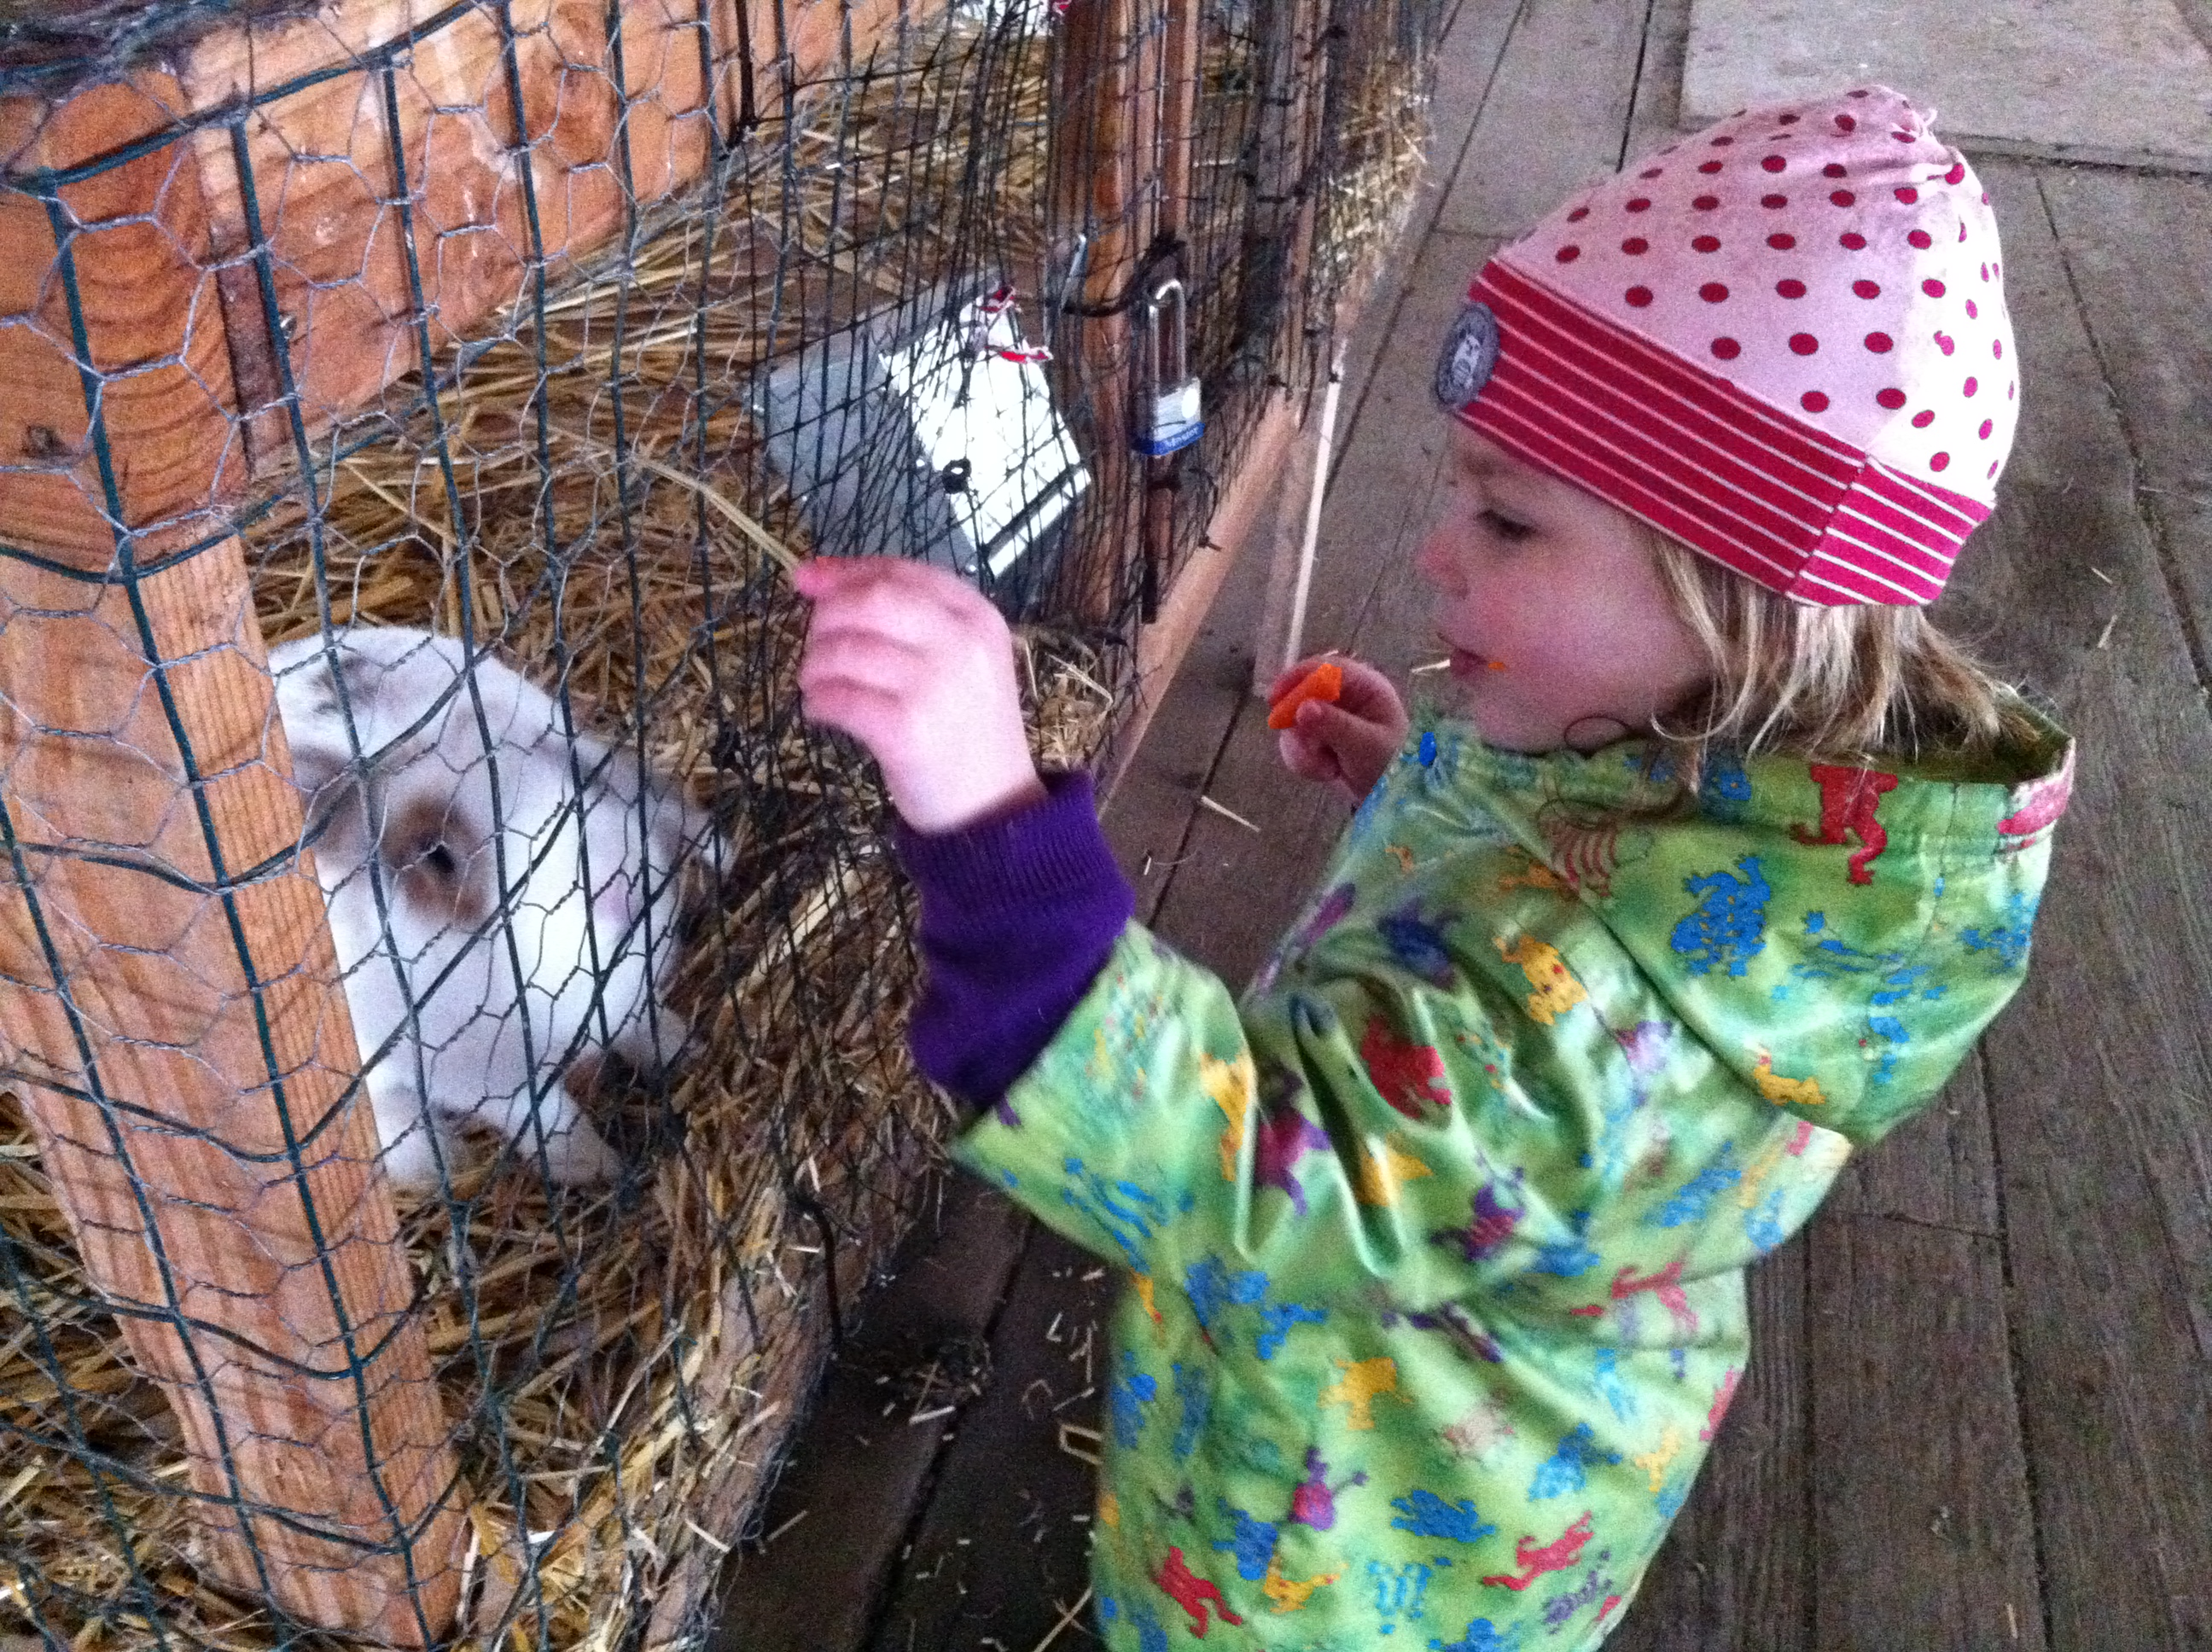 E enjoys encountering a bunny at the Sauvie Island Pumpkin Patch